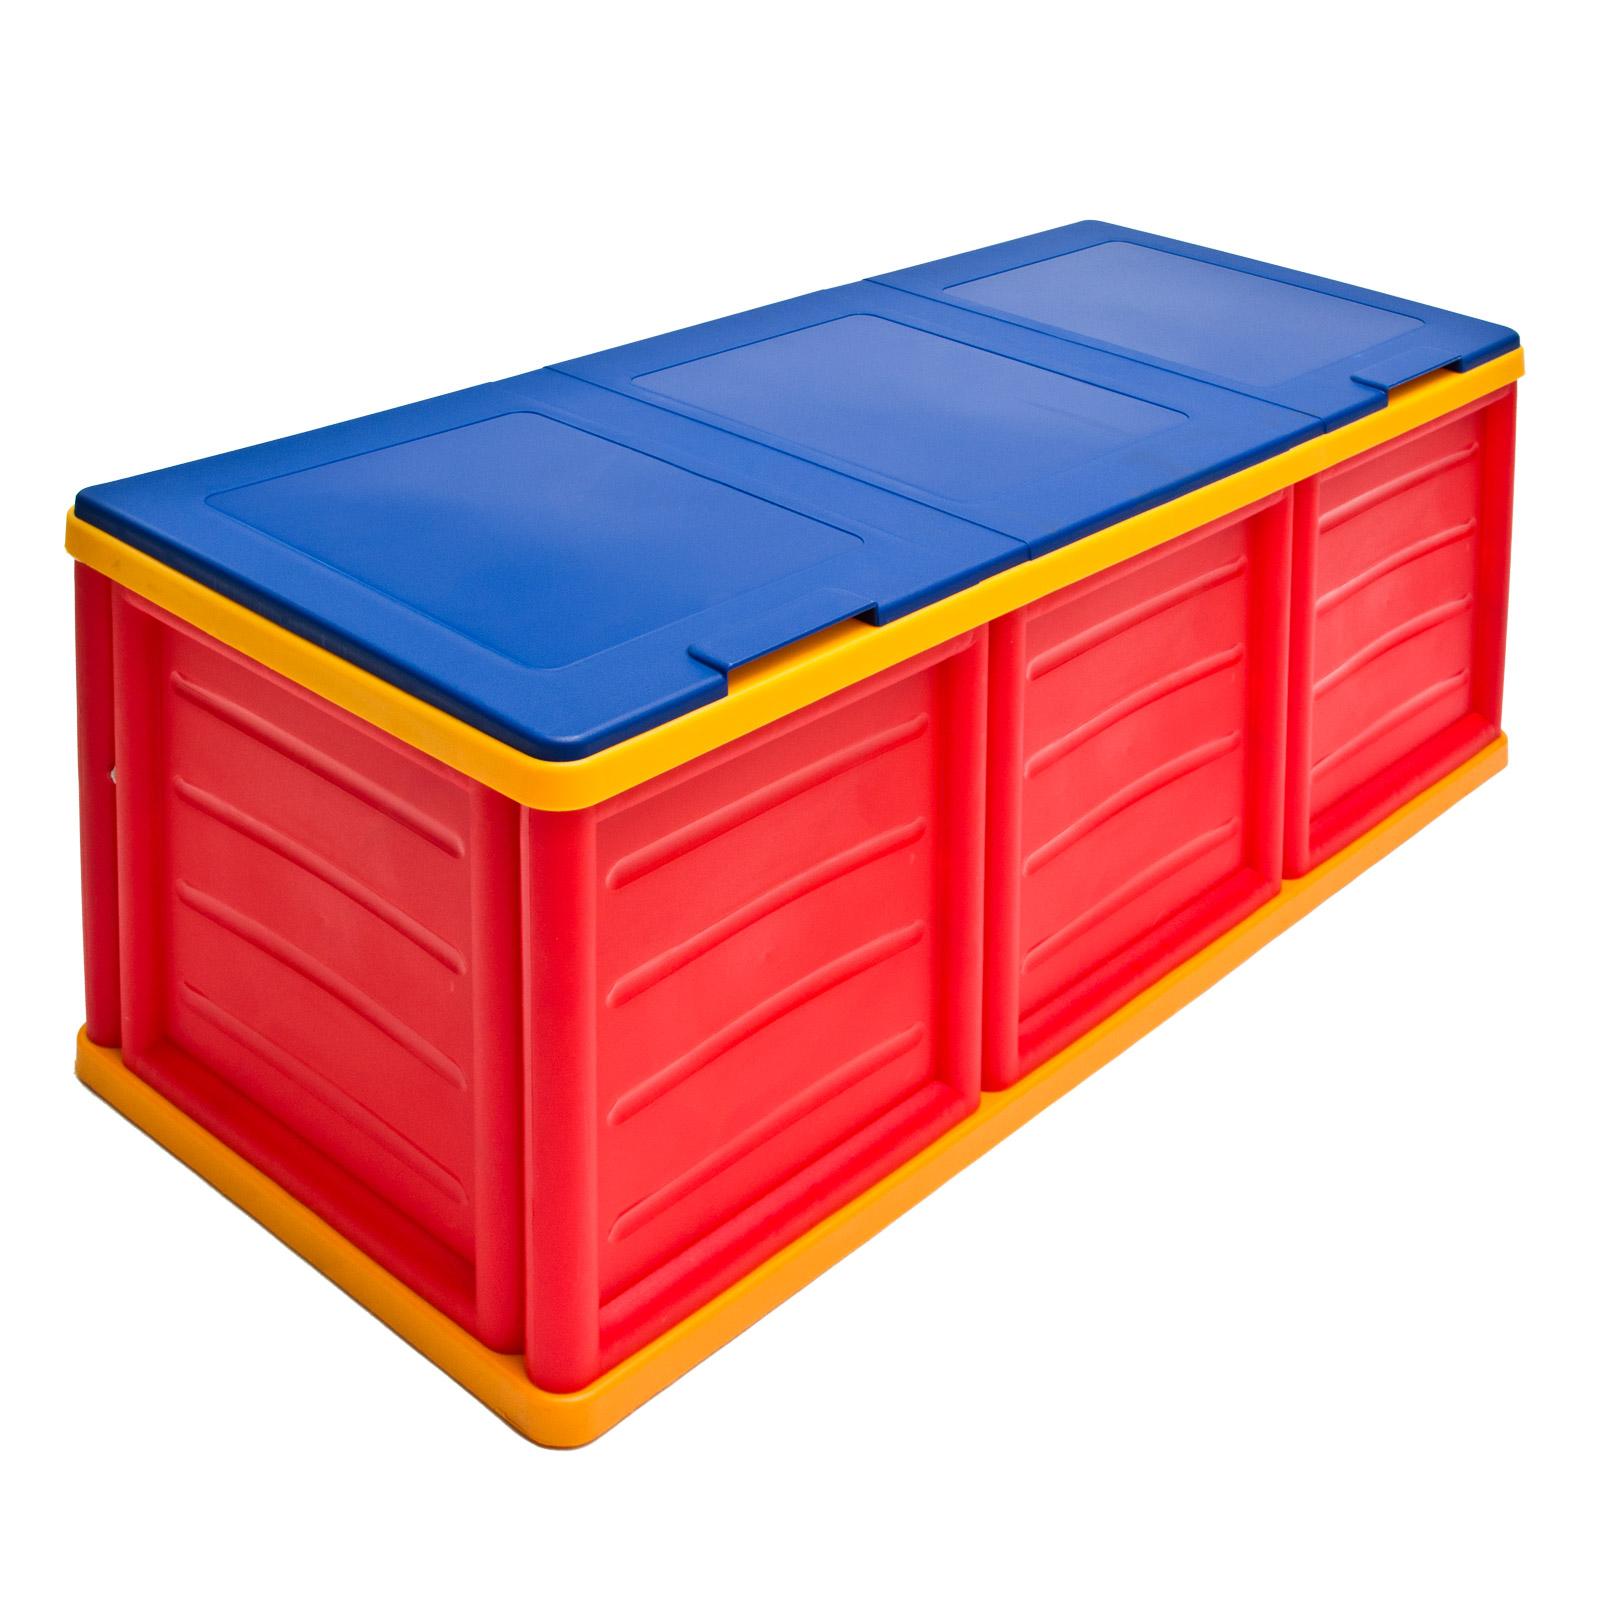 910502 kunststofftruhe vielzwecktruhe kunststoff truhe aufbewahrungsbox ebay. Black Bedroom Furniture Sets. Home Design Ideas